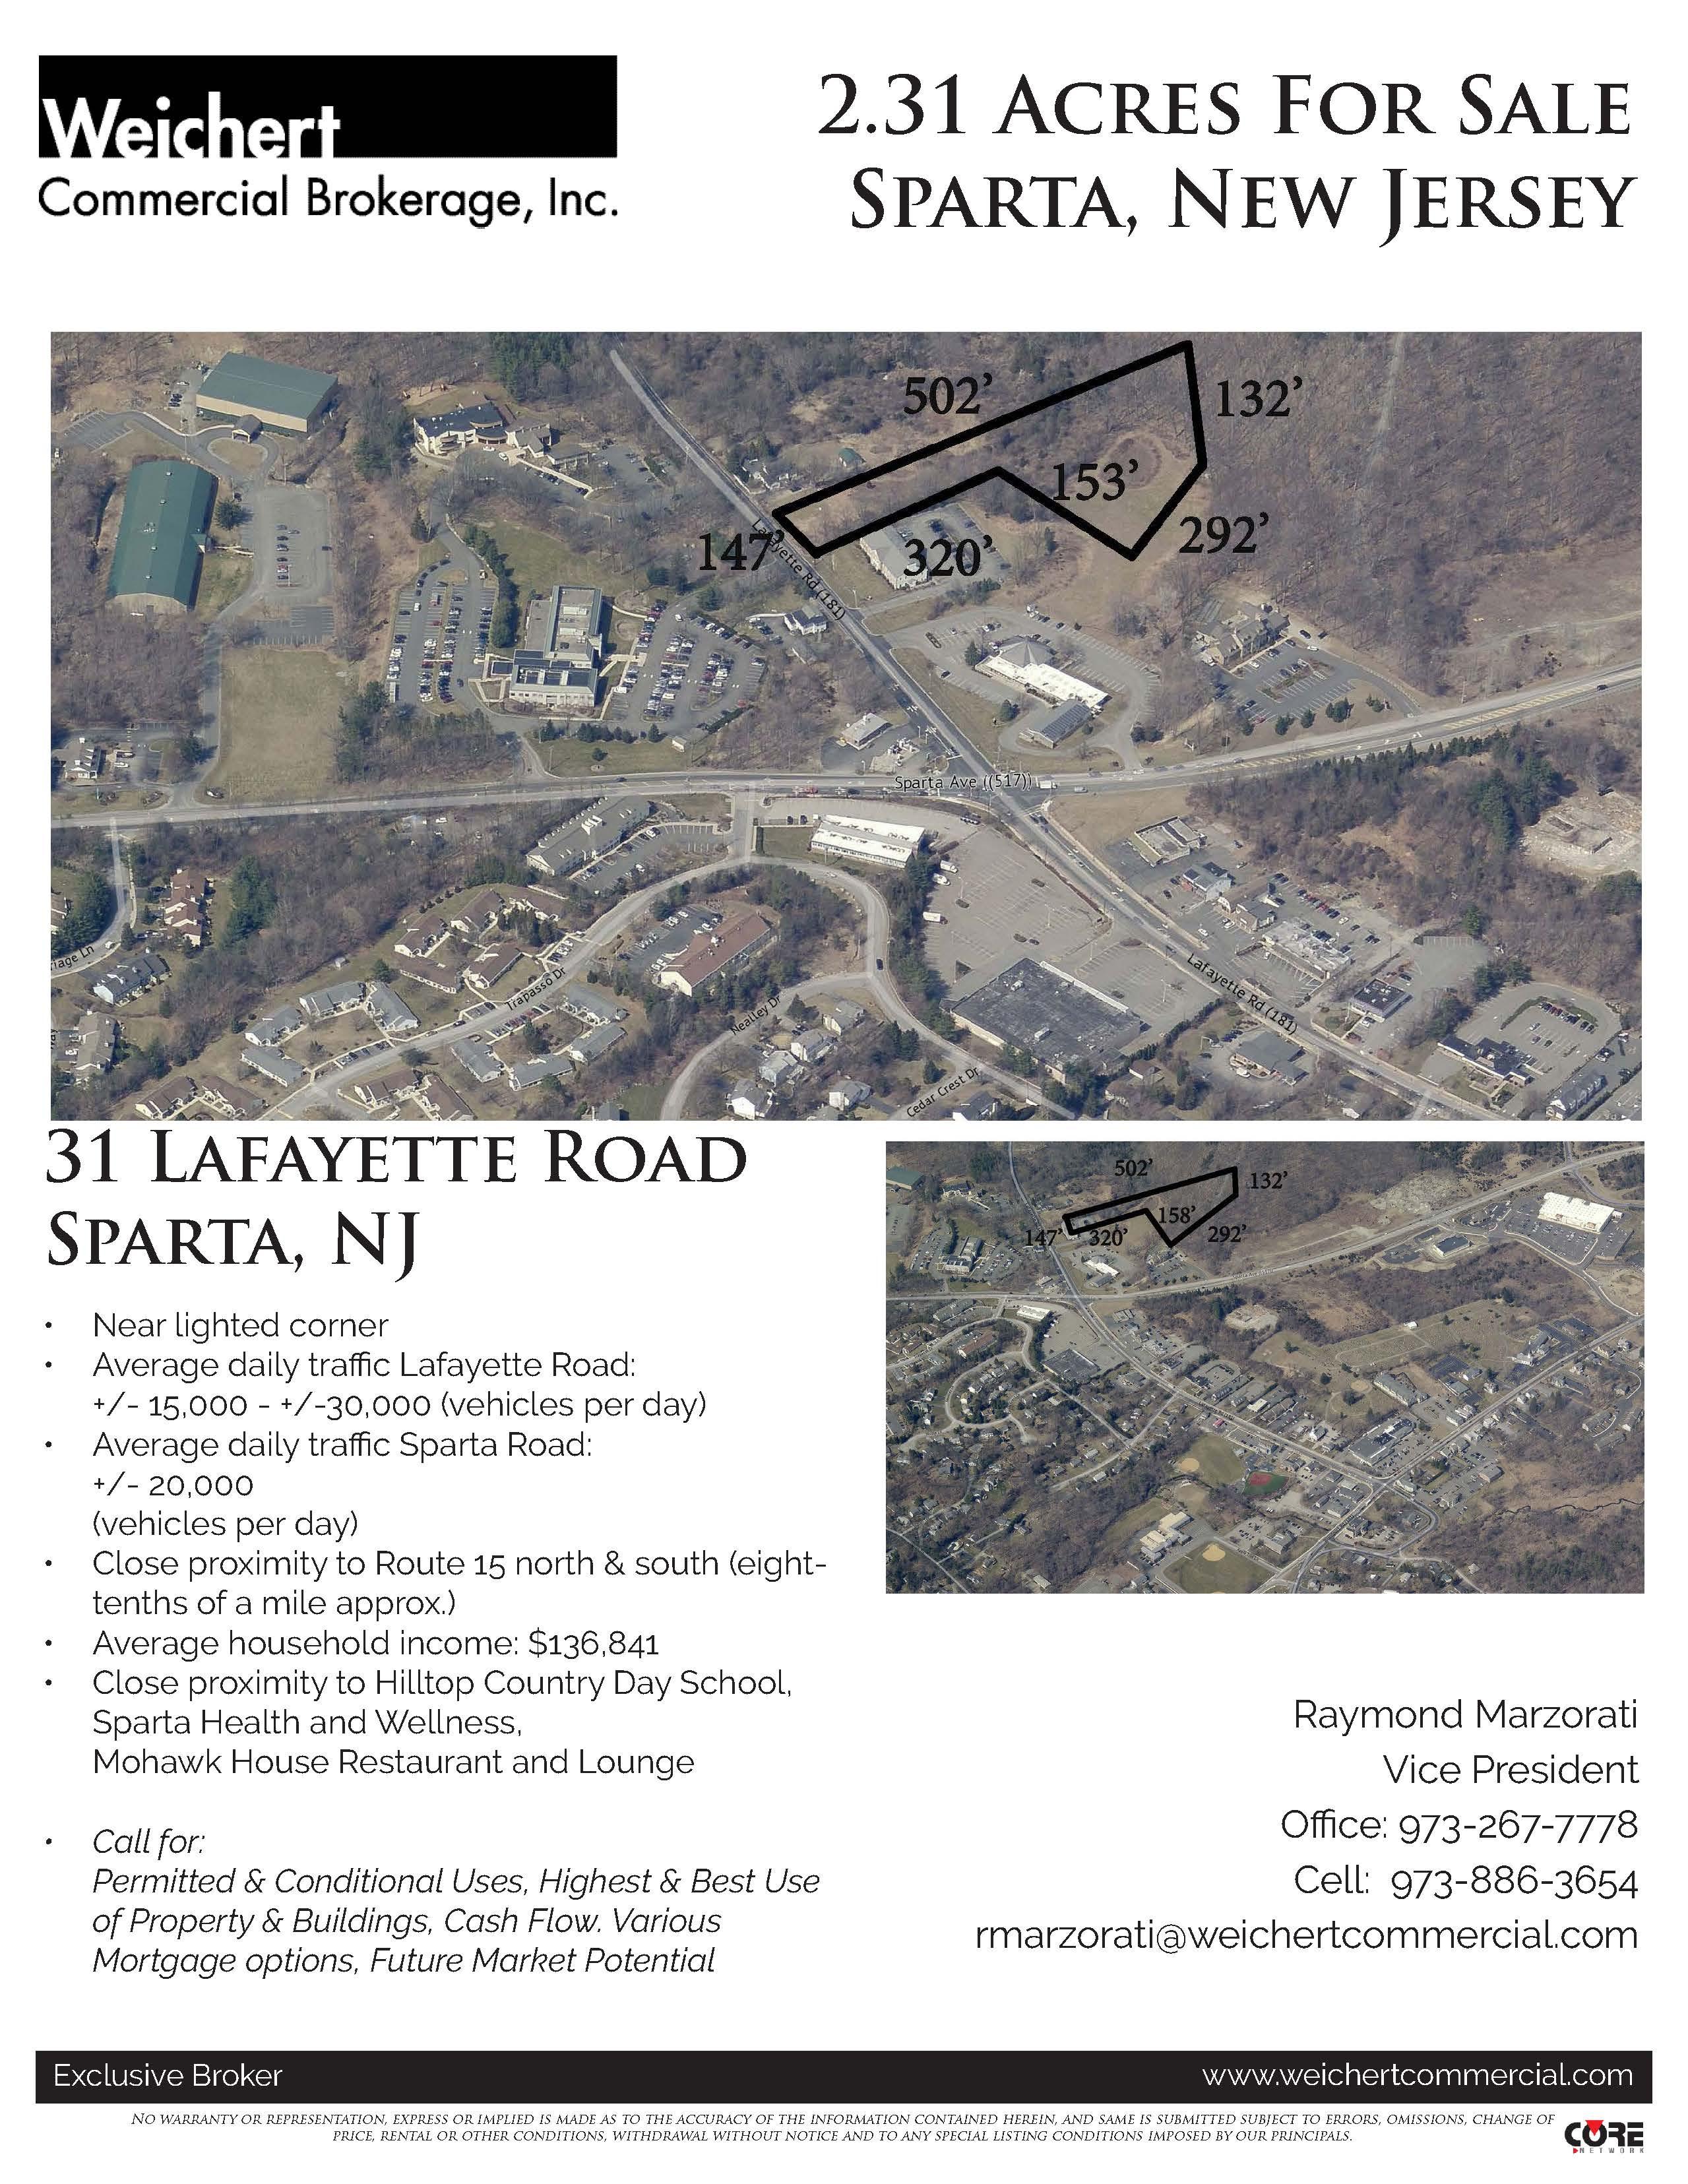 Current Marzorati- 31 Lafayette Rd, Sparta